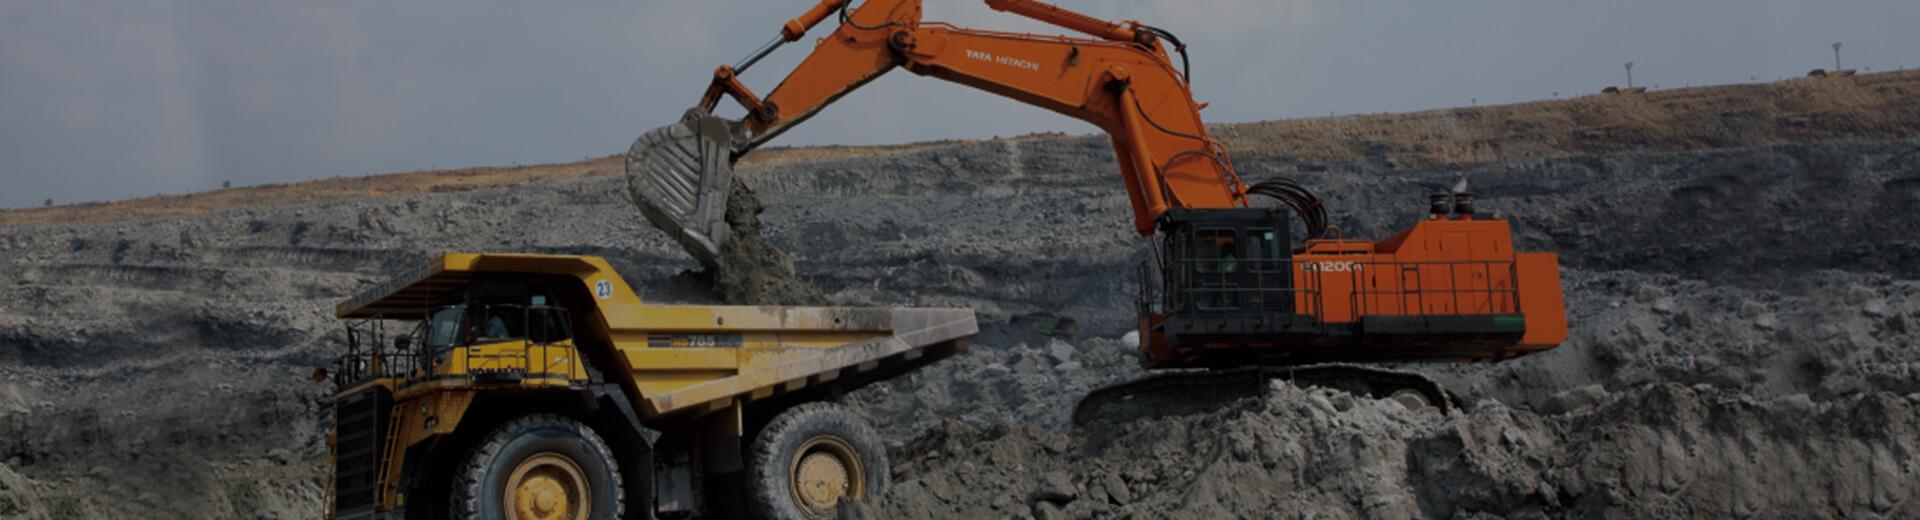 EX1200-V Mining Excavator